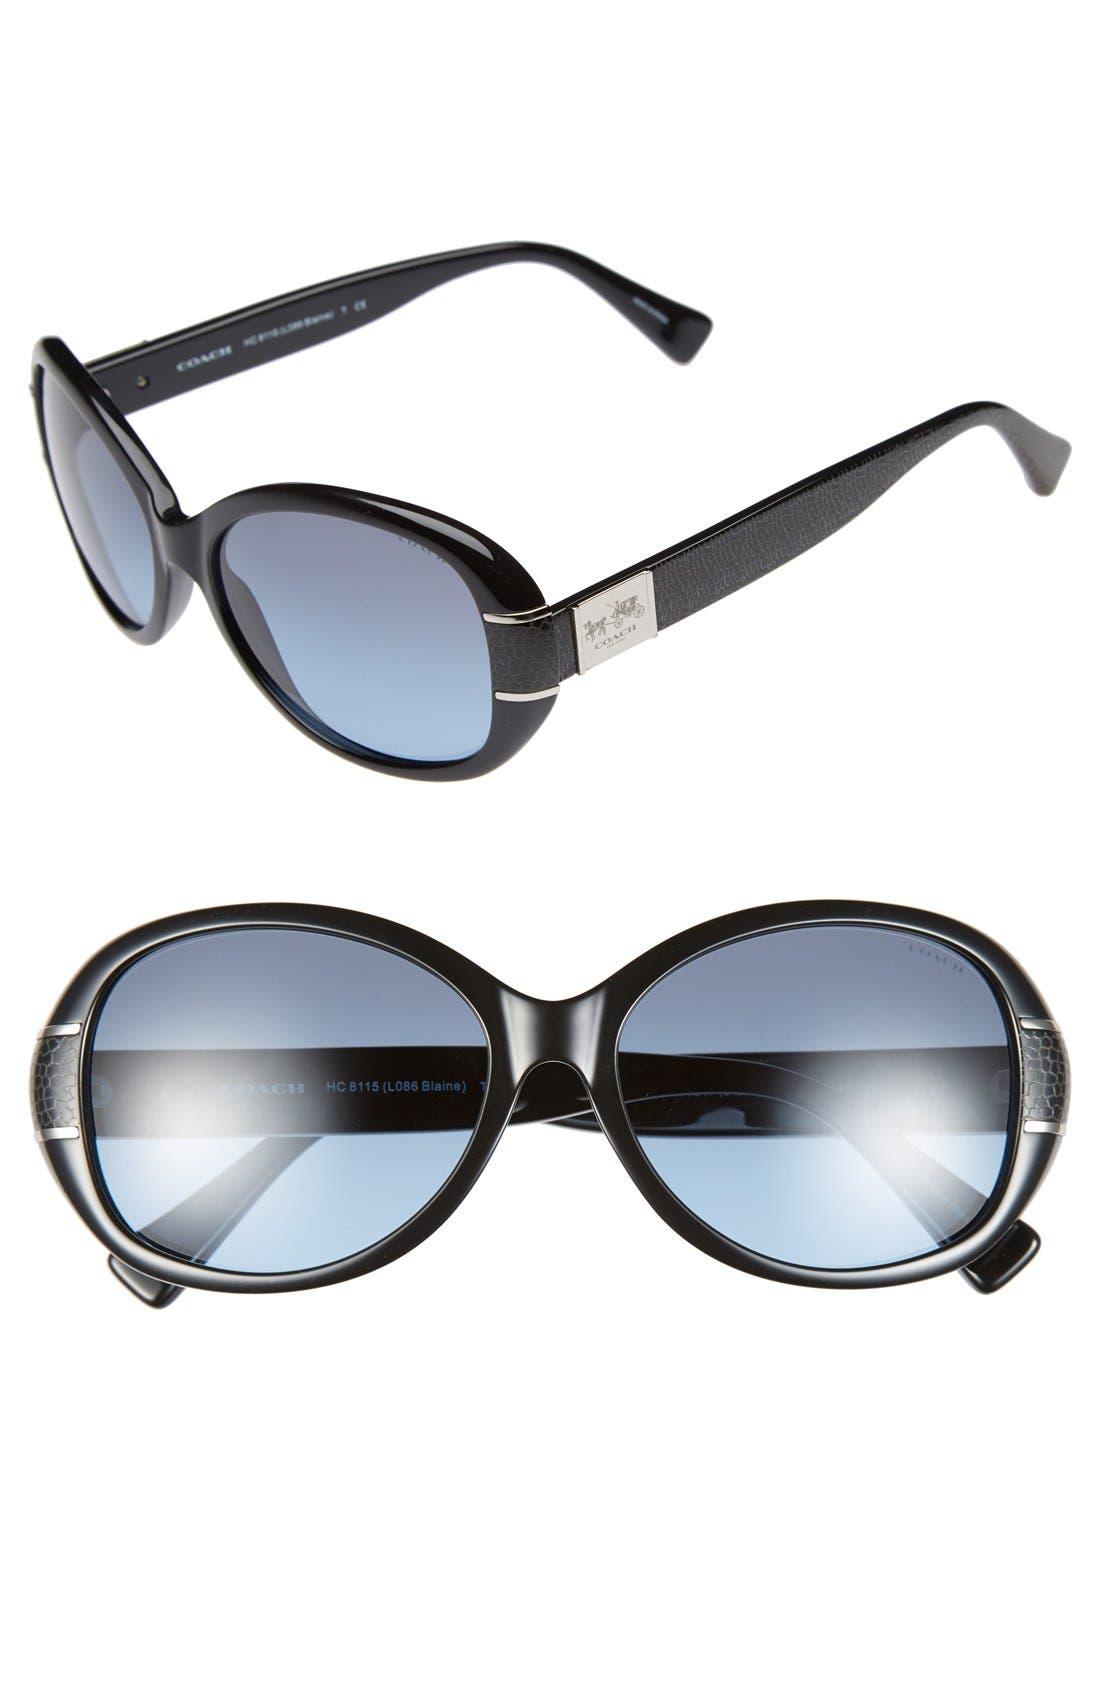 64e843c5e047 ... coupon code for coach blaine 57mm sunglasses nordstrom 22692 202d0  discount code for coach blaine hc8115 525514 garnet red oval sunglasses  rose gradient ...